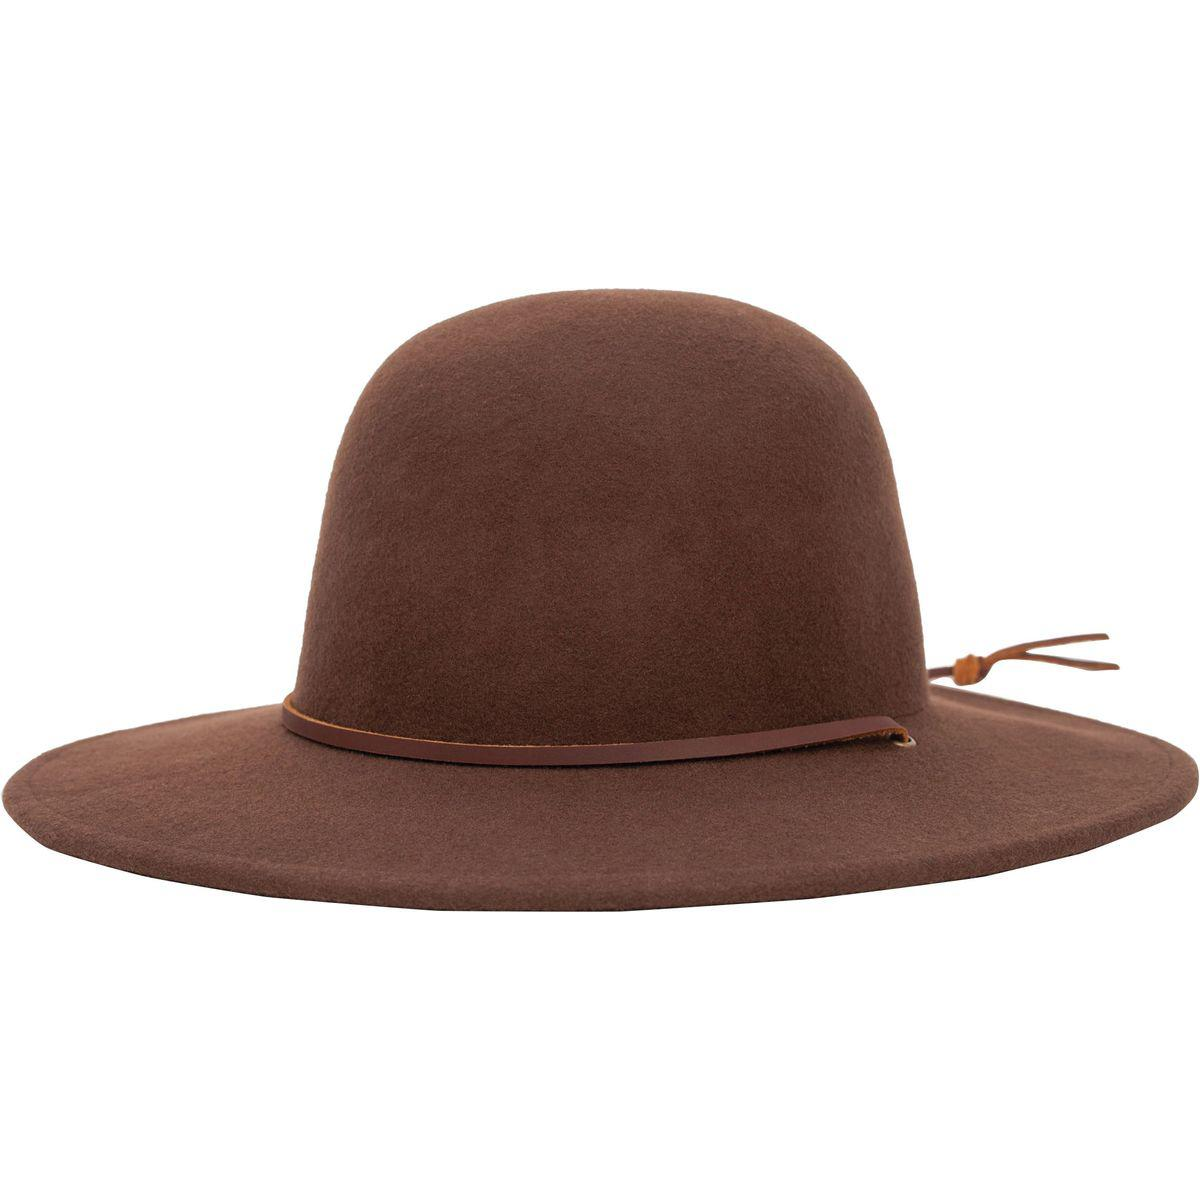 3bdecf13d9 Brixton Brown Tiller Hat